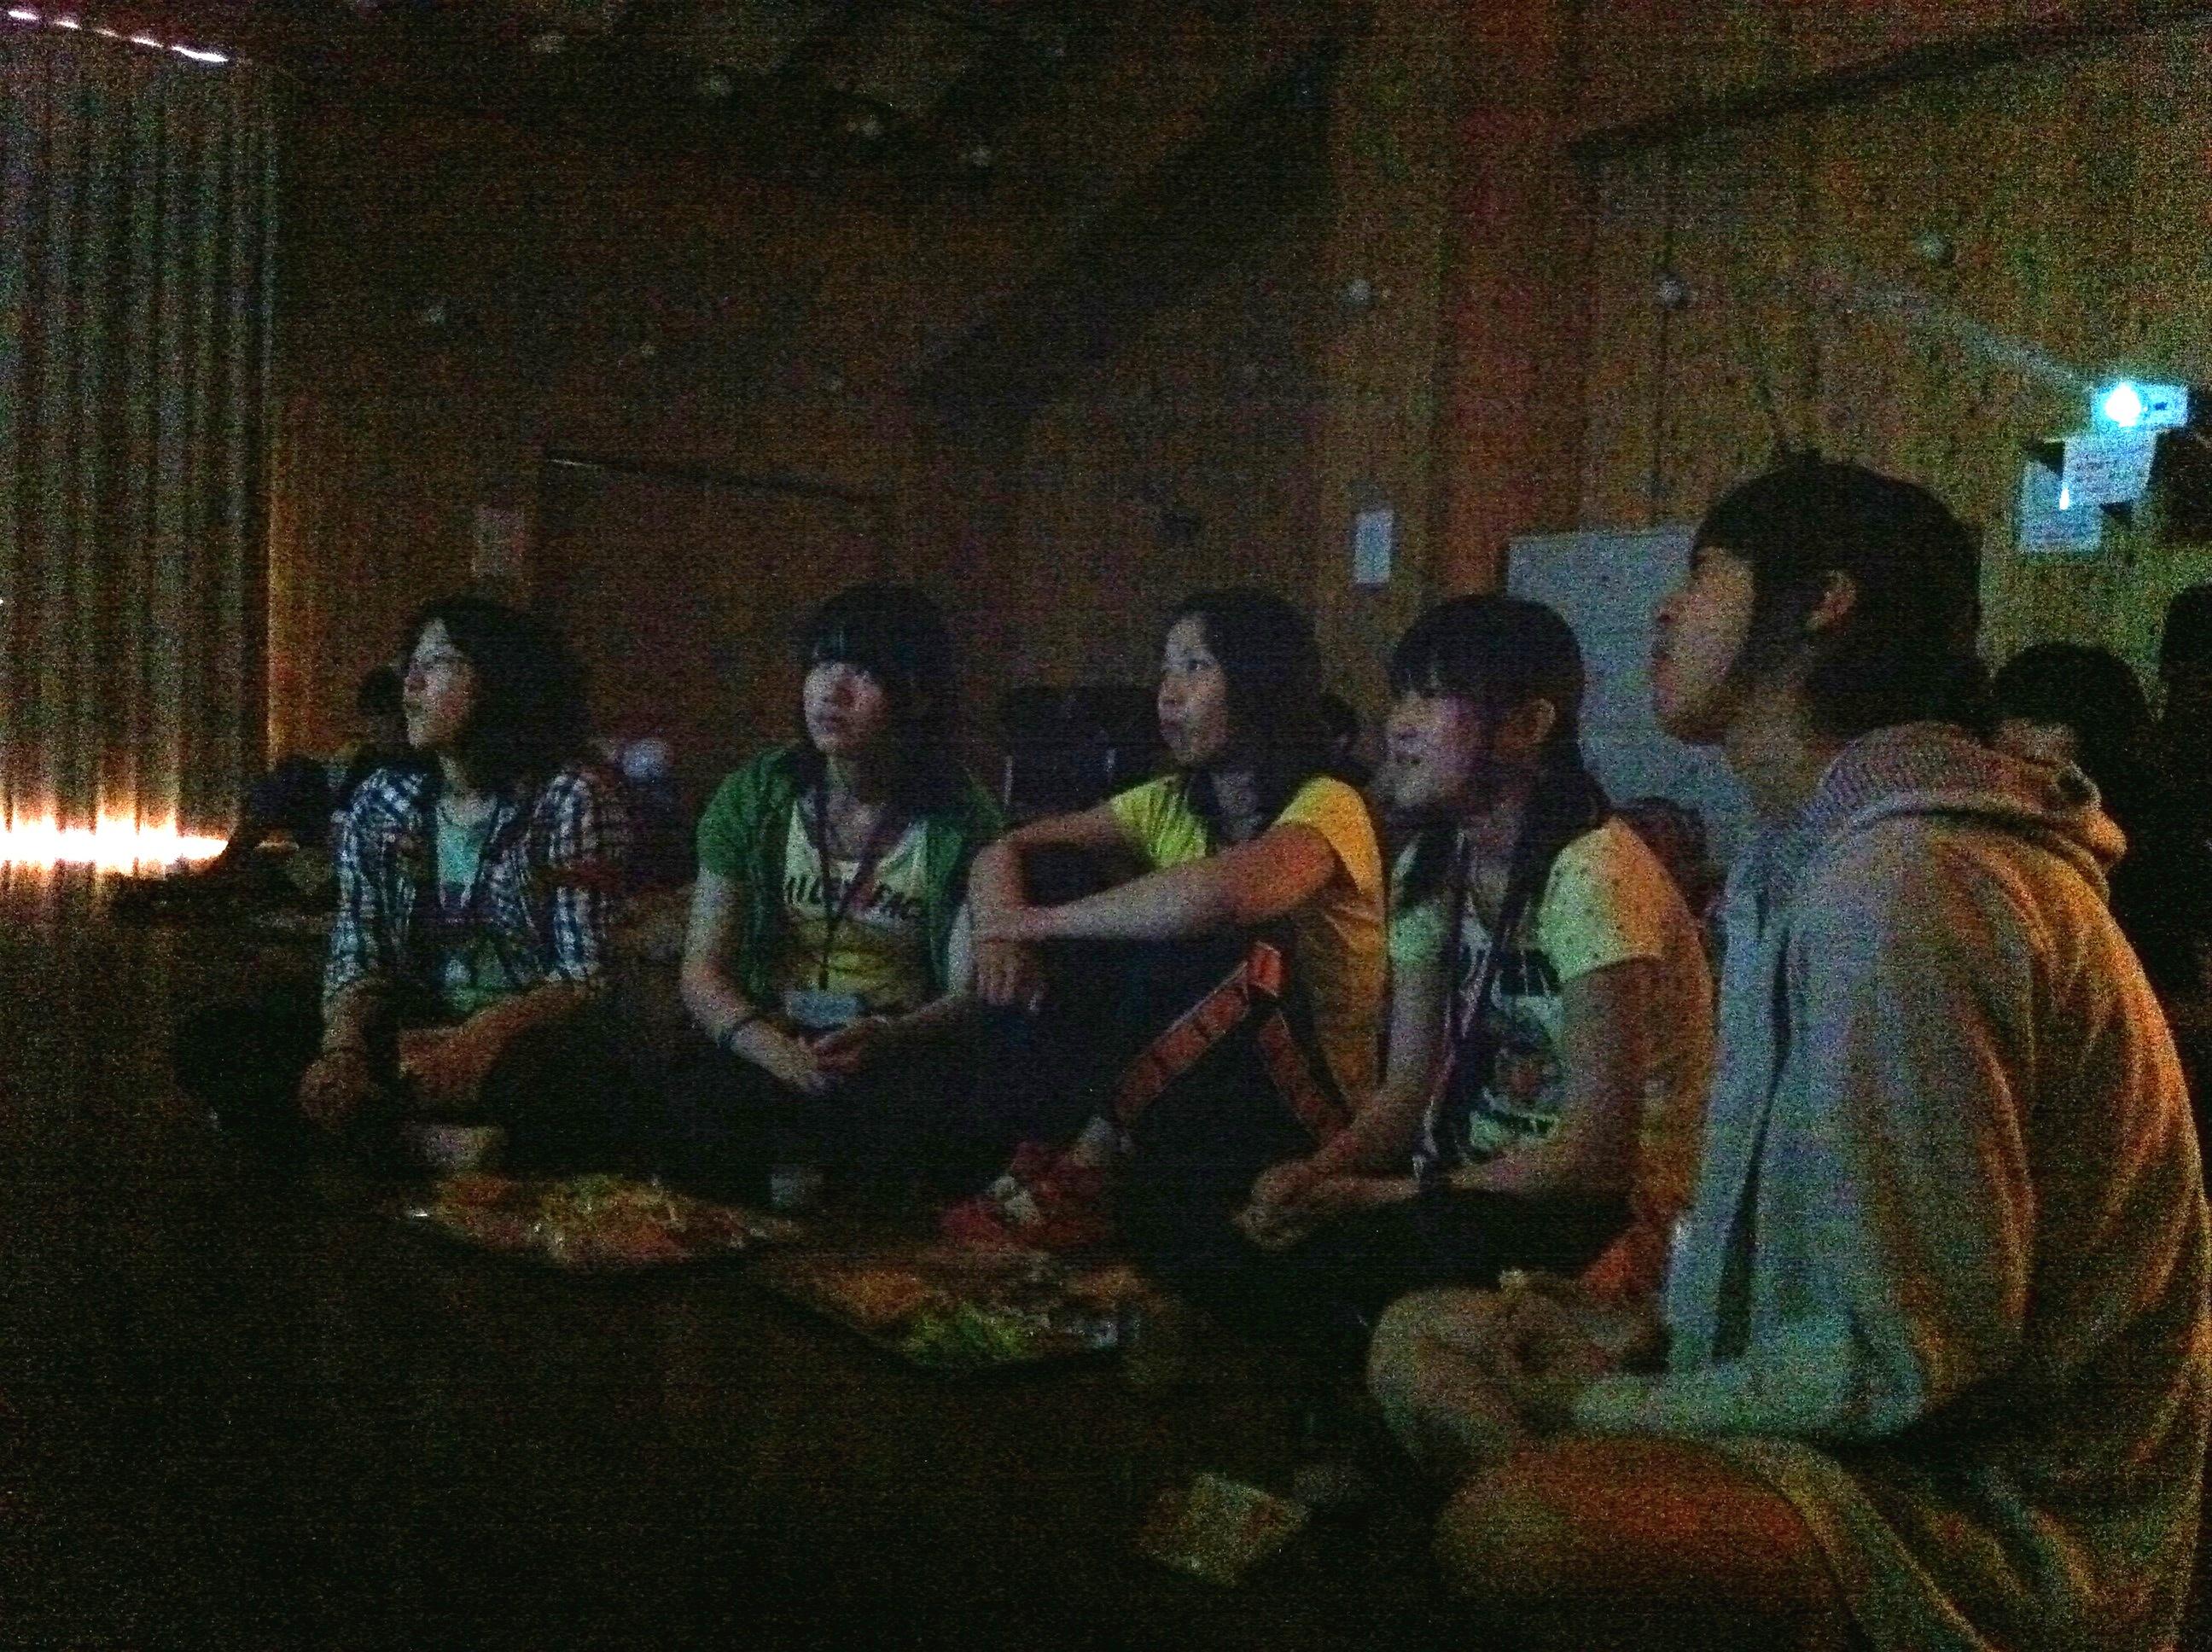 http://www.kodomonotsubasa.com/2011/07/30/0729matome07.jpg